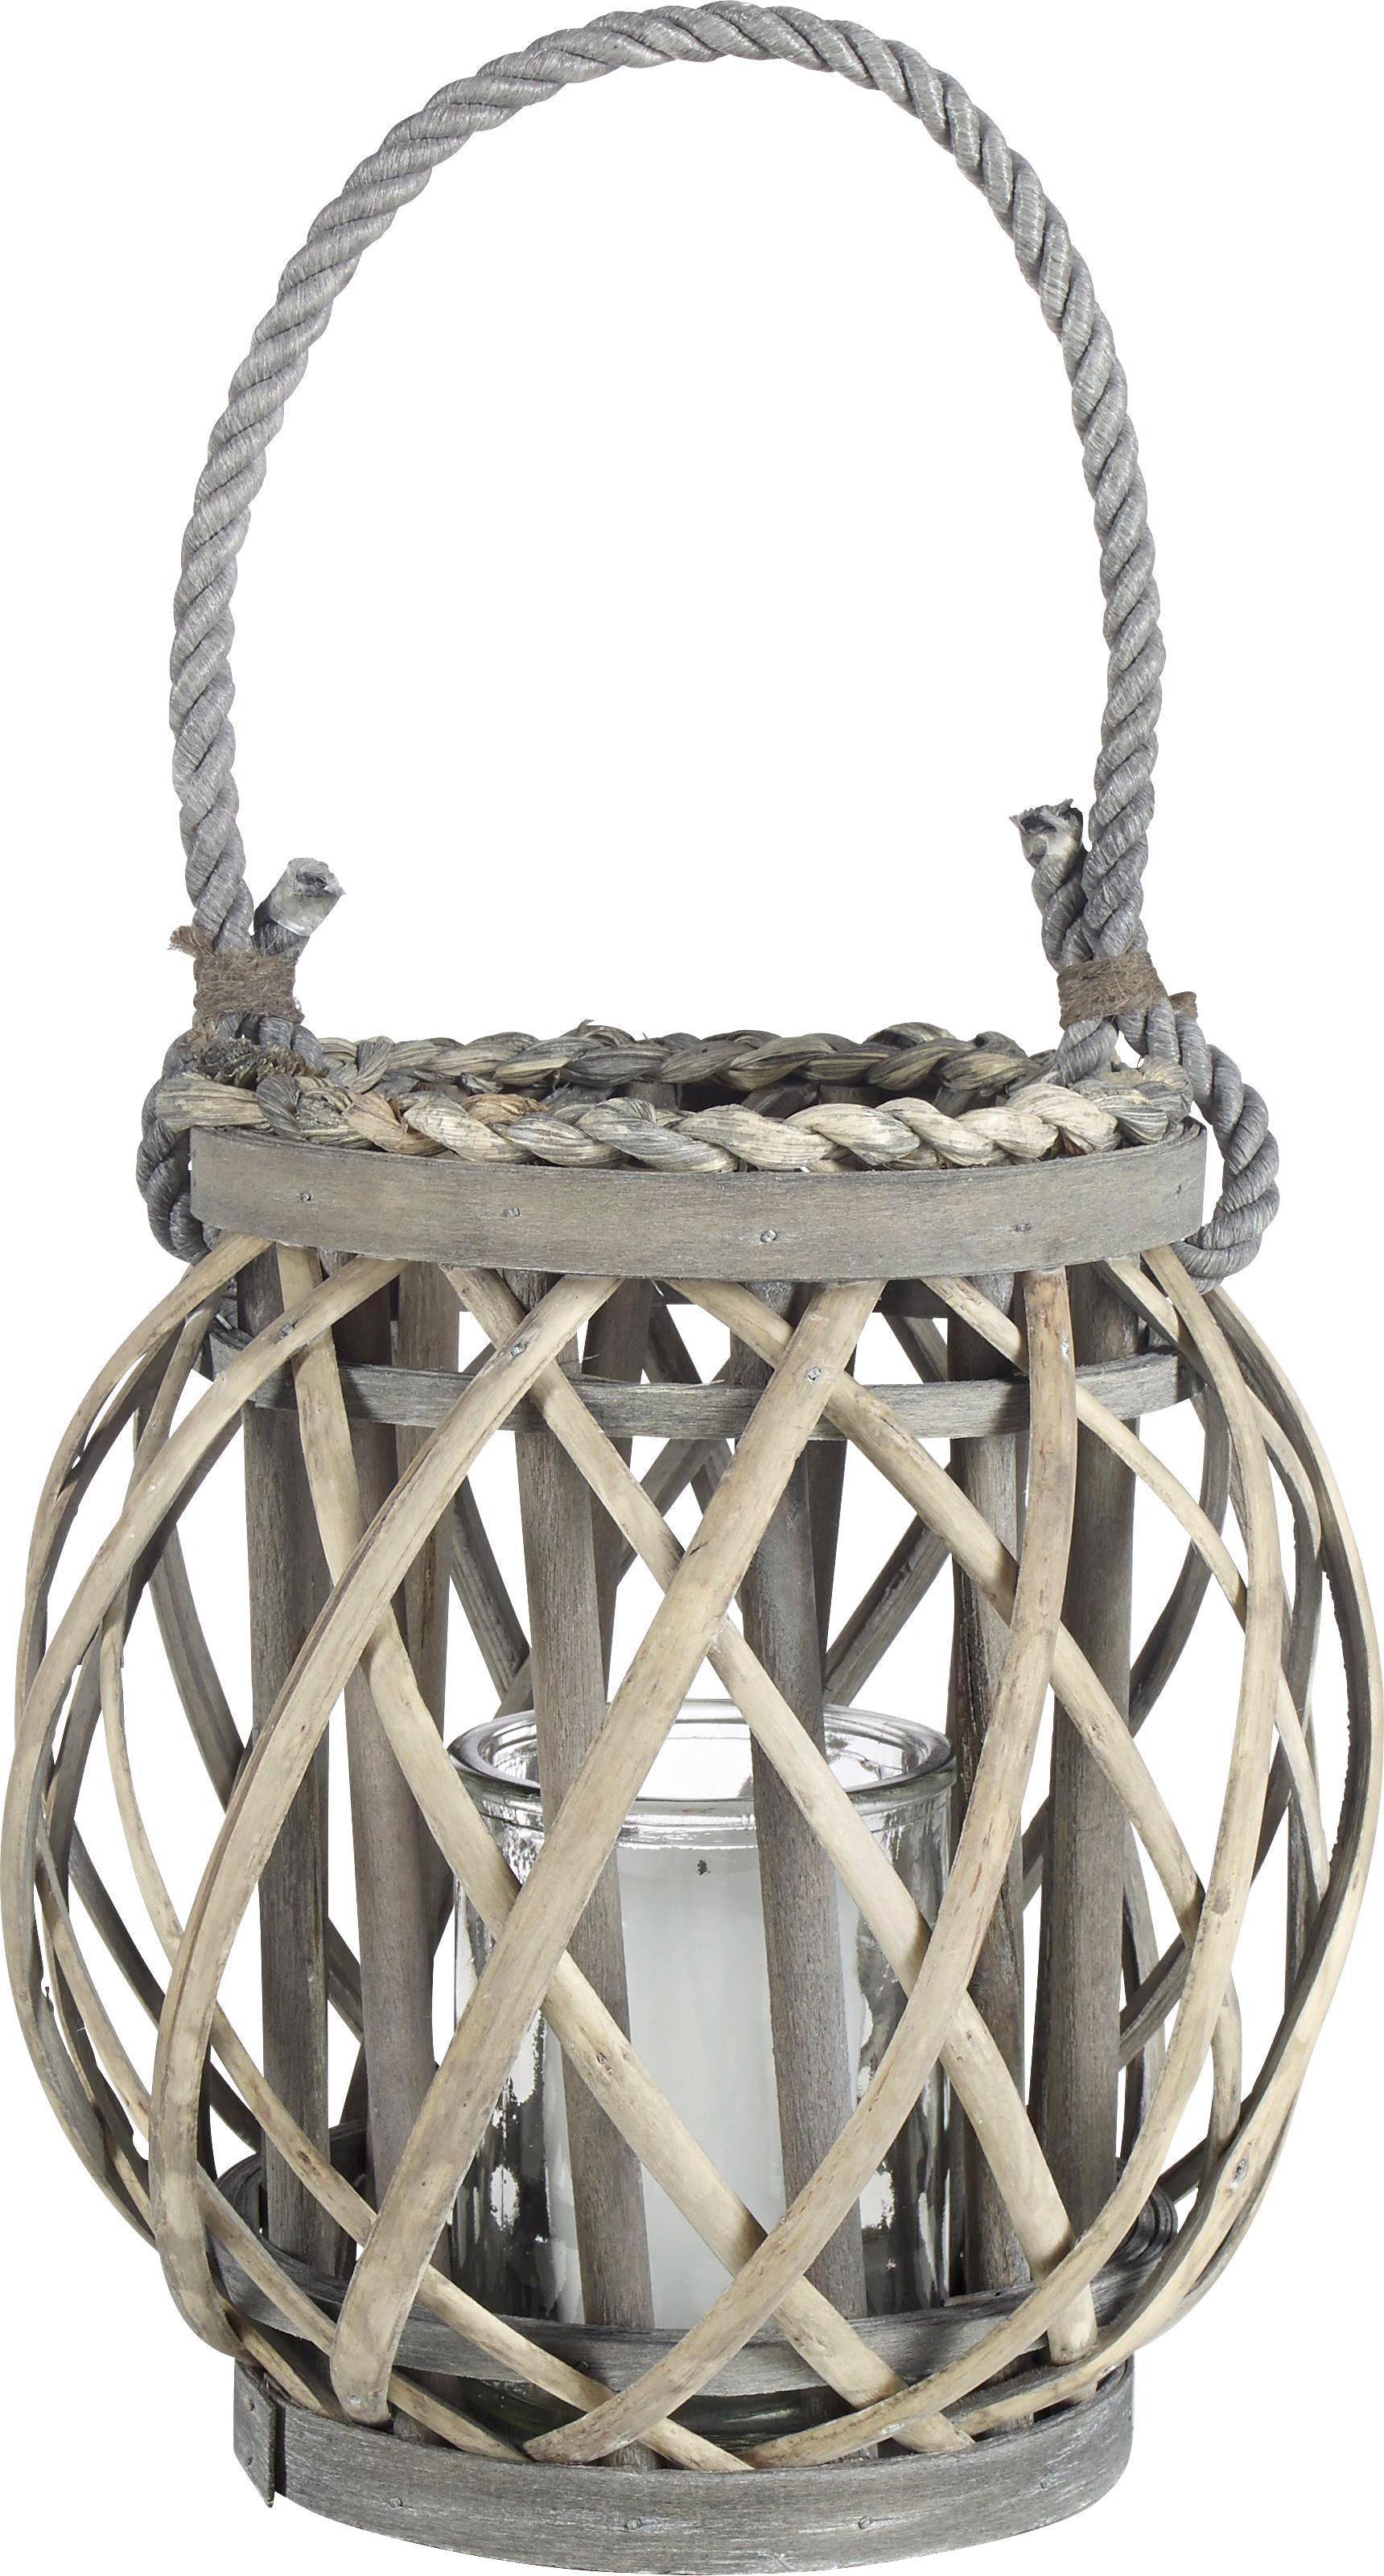 LJUSLYKTA - klar/grå, Trend, trä/glas (15/21cm) - Ambia Home